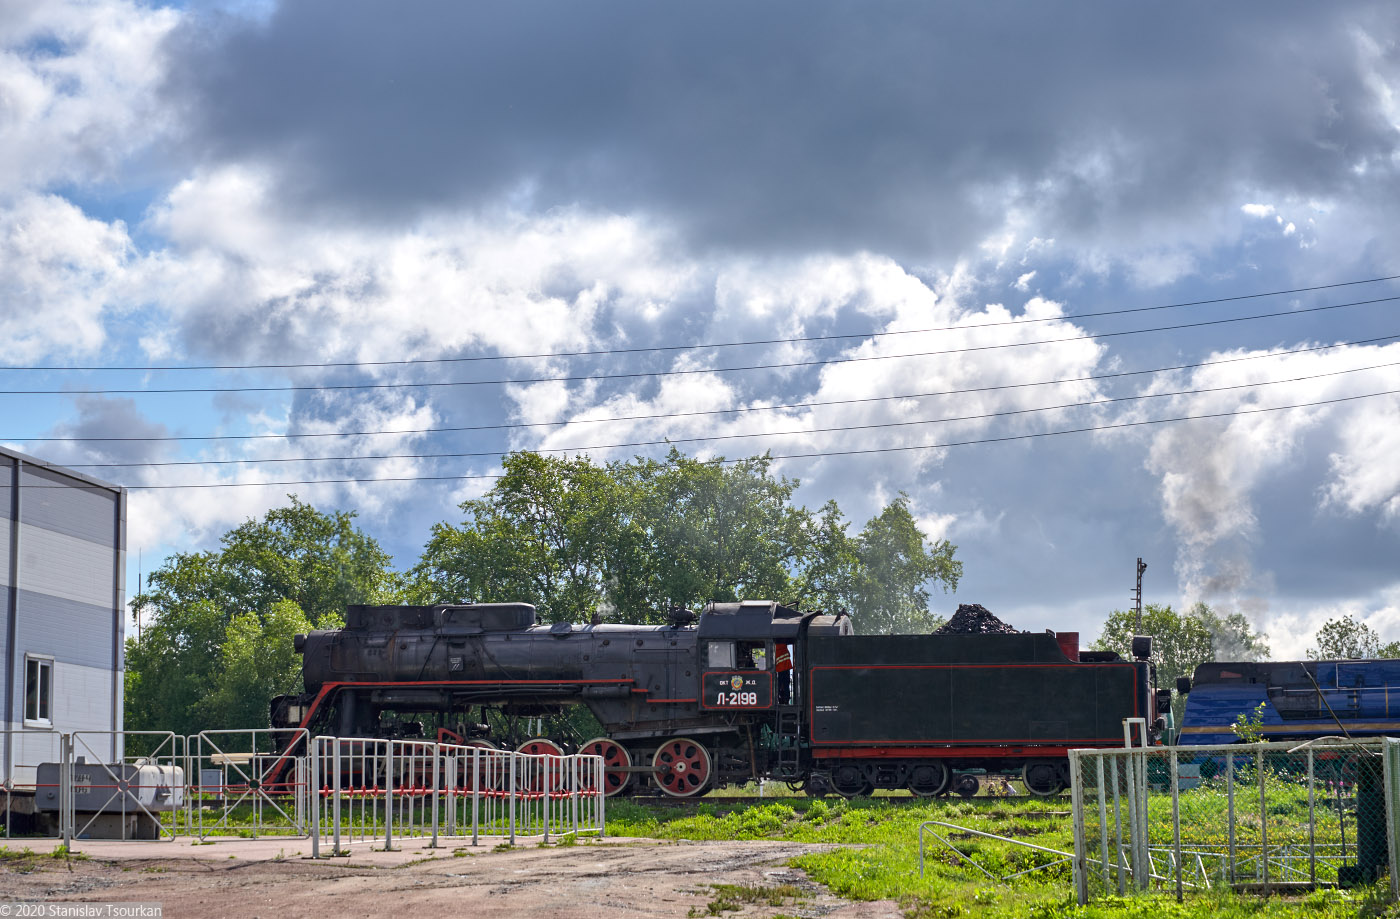 Карелия, республика Карелия, Сортавала, russia, karjala, sortavala, станция сортавала, железная дорога, паровоз, Л-2198